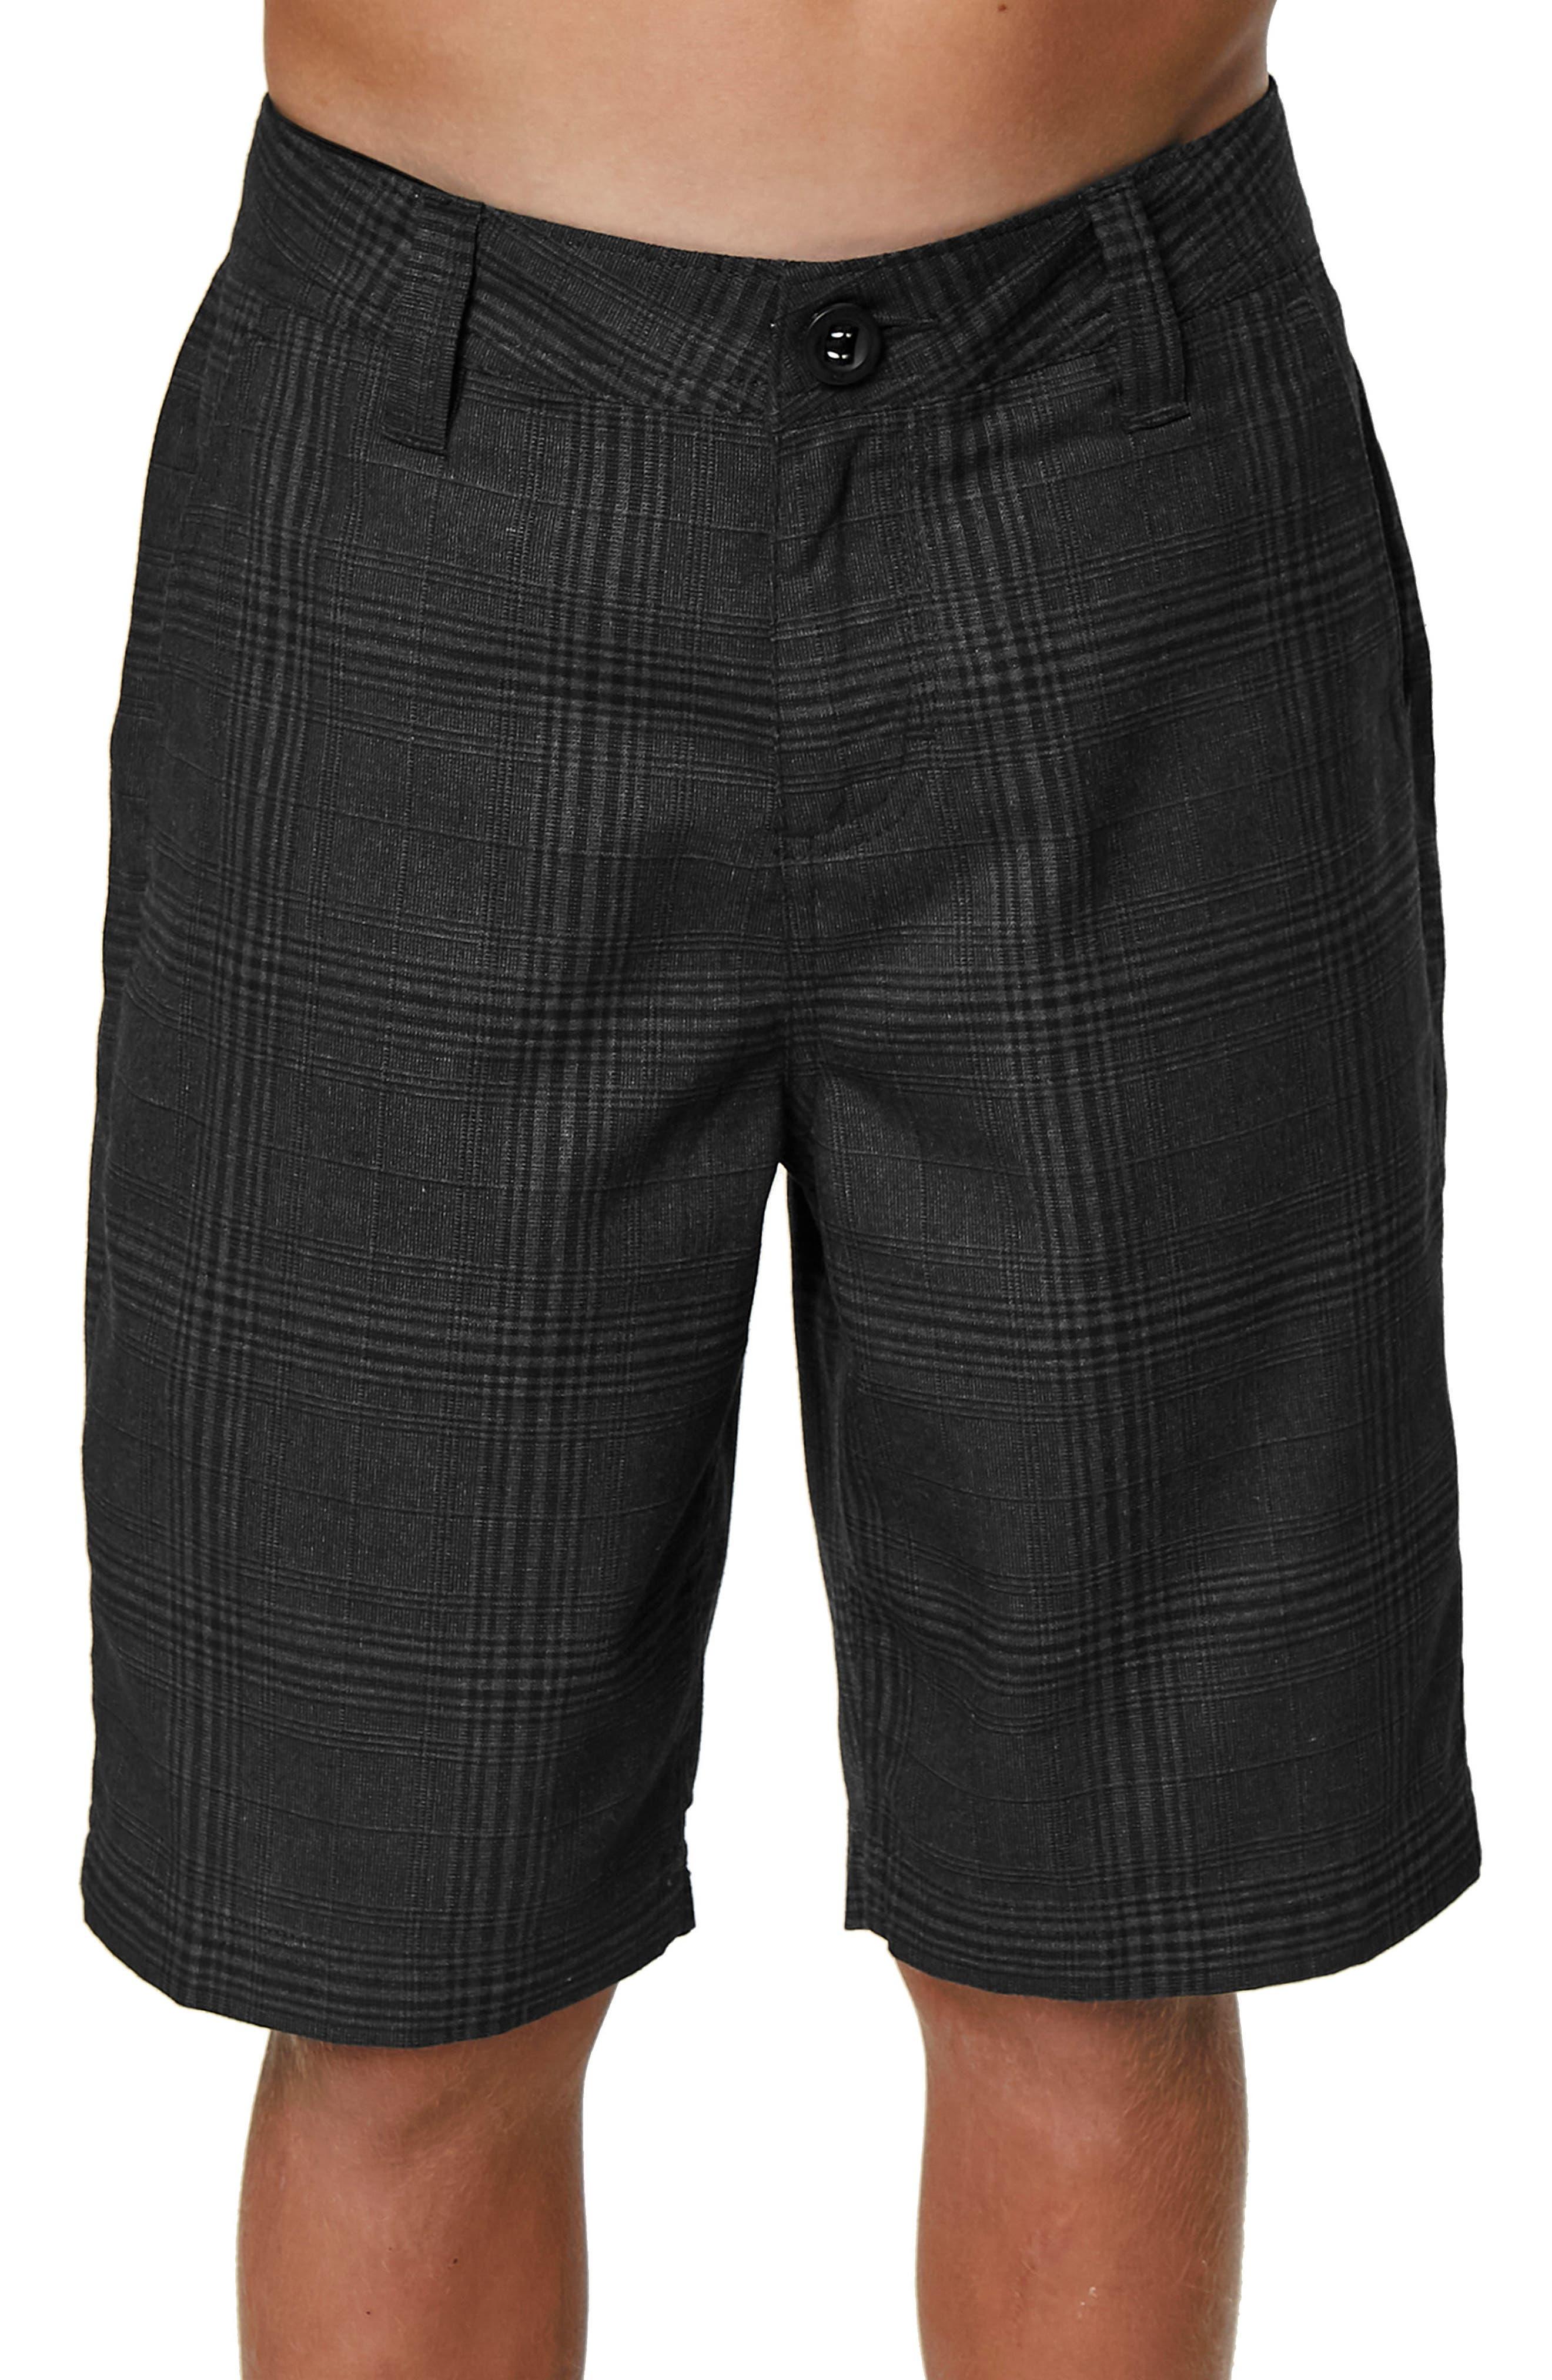 Bristol Plaid Shorts,                             Alternate thumbnail 2, color,                             001